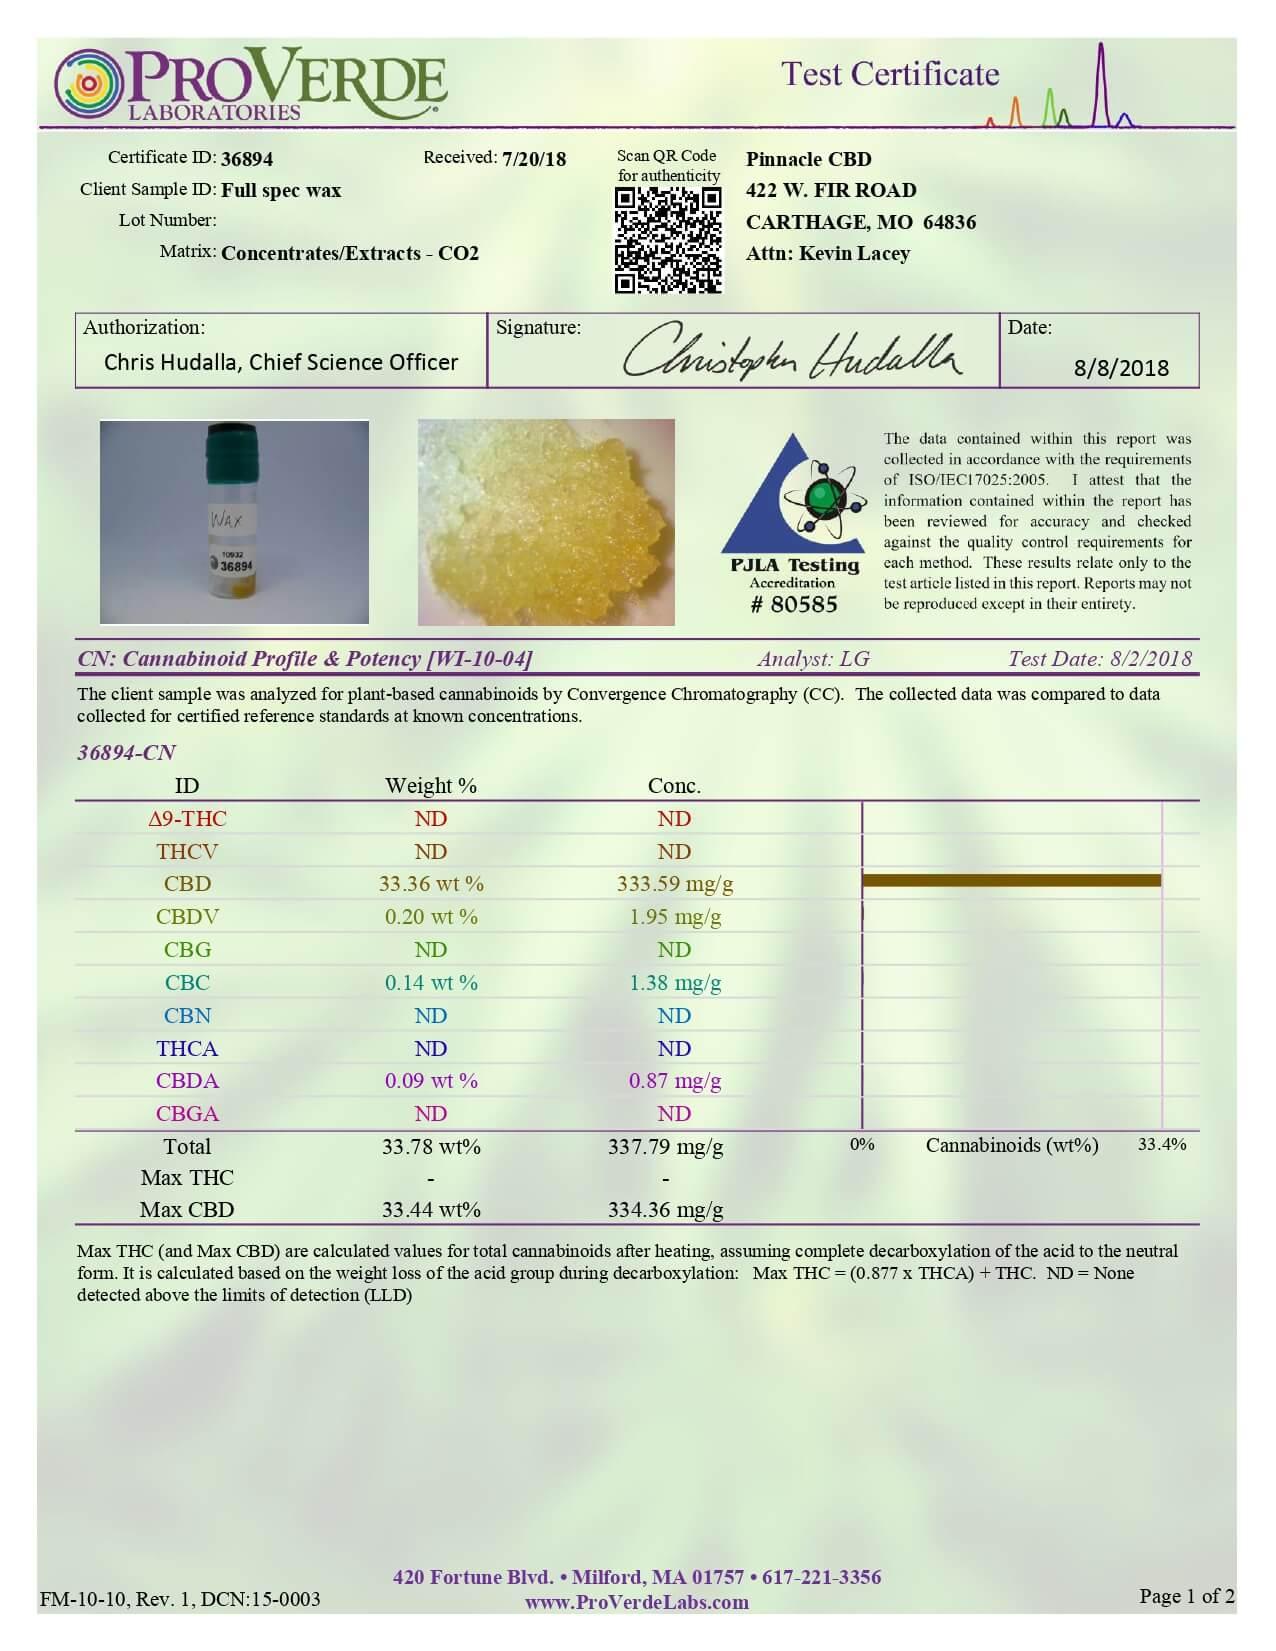 Pinnacle Hemp CBD Concentrate Full Spectrum Crumble Lab Report